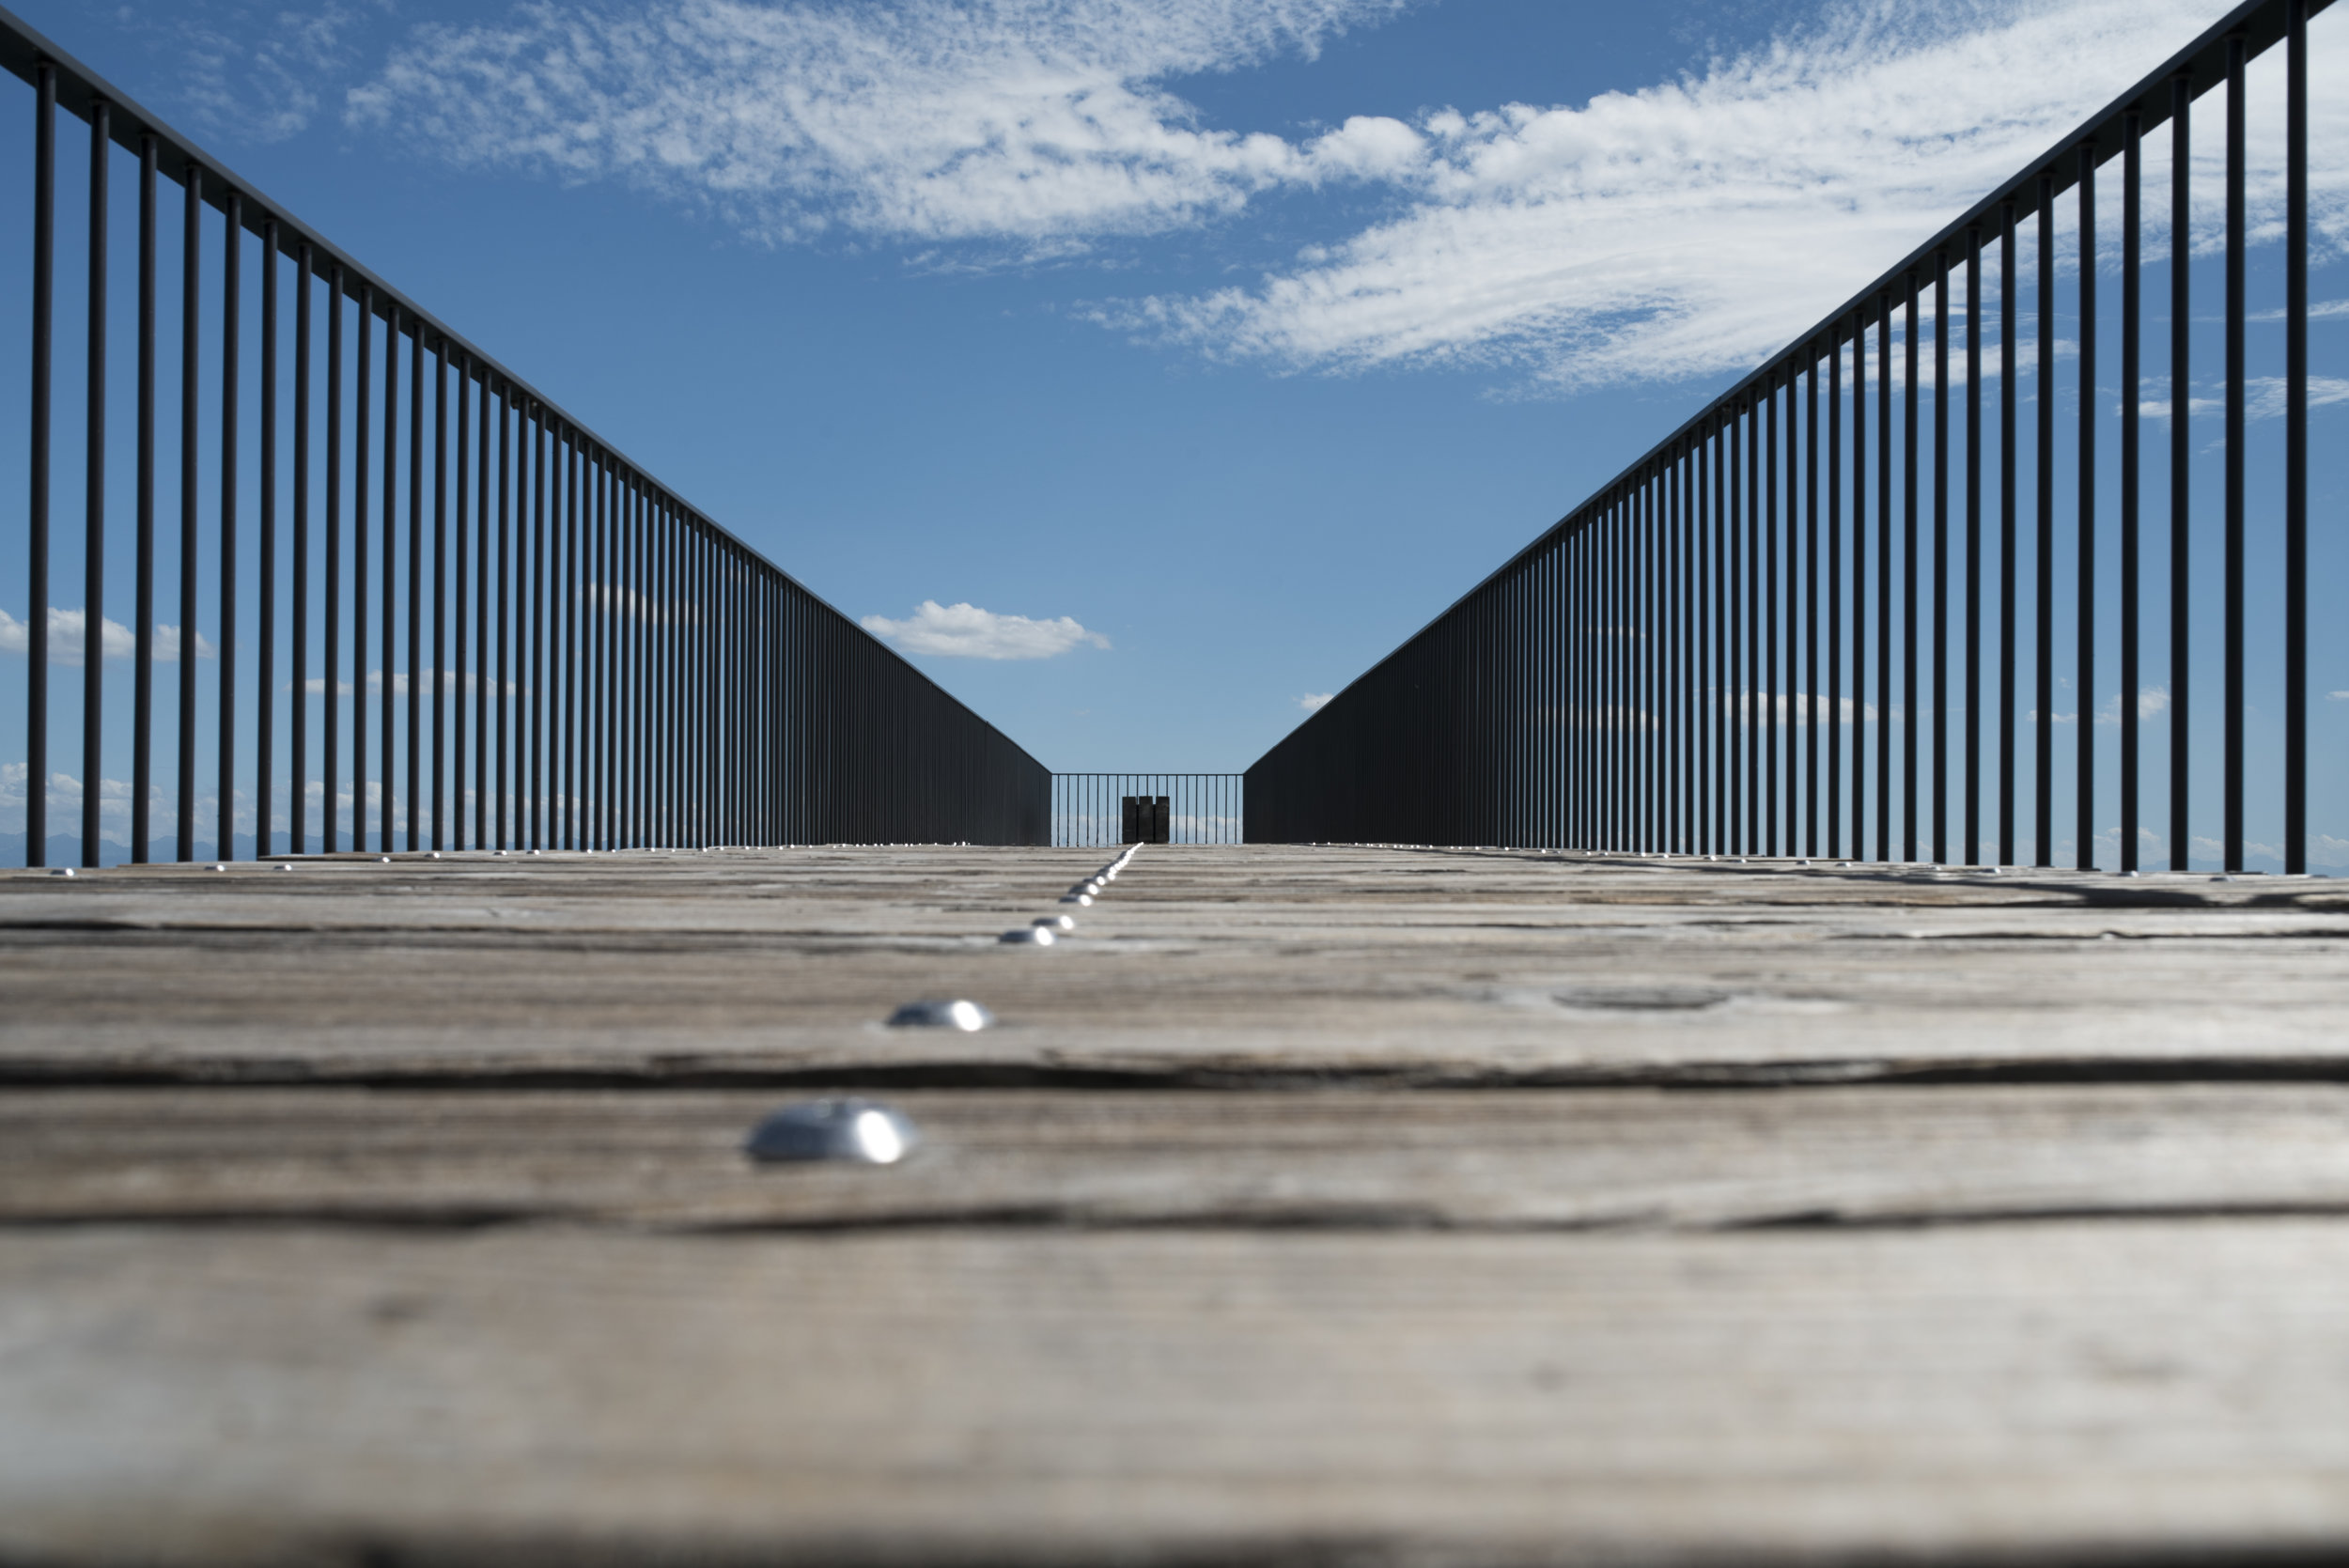 Boardwalk-pexels-photo-130053.jpeg